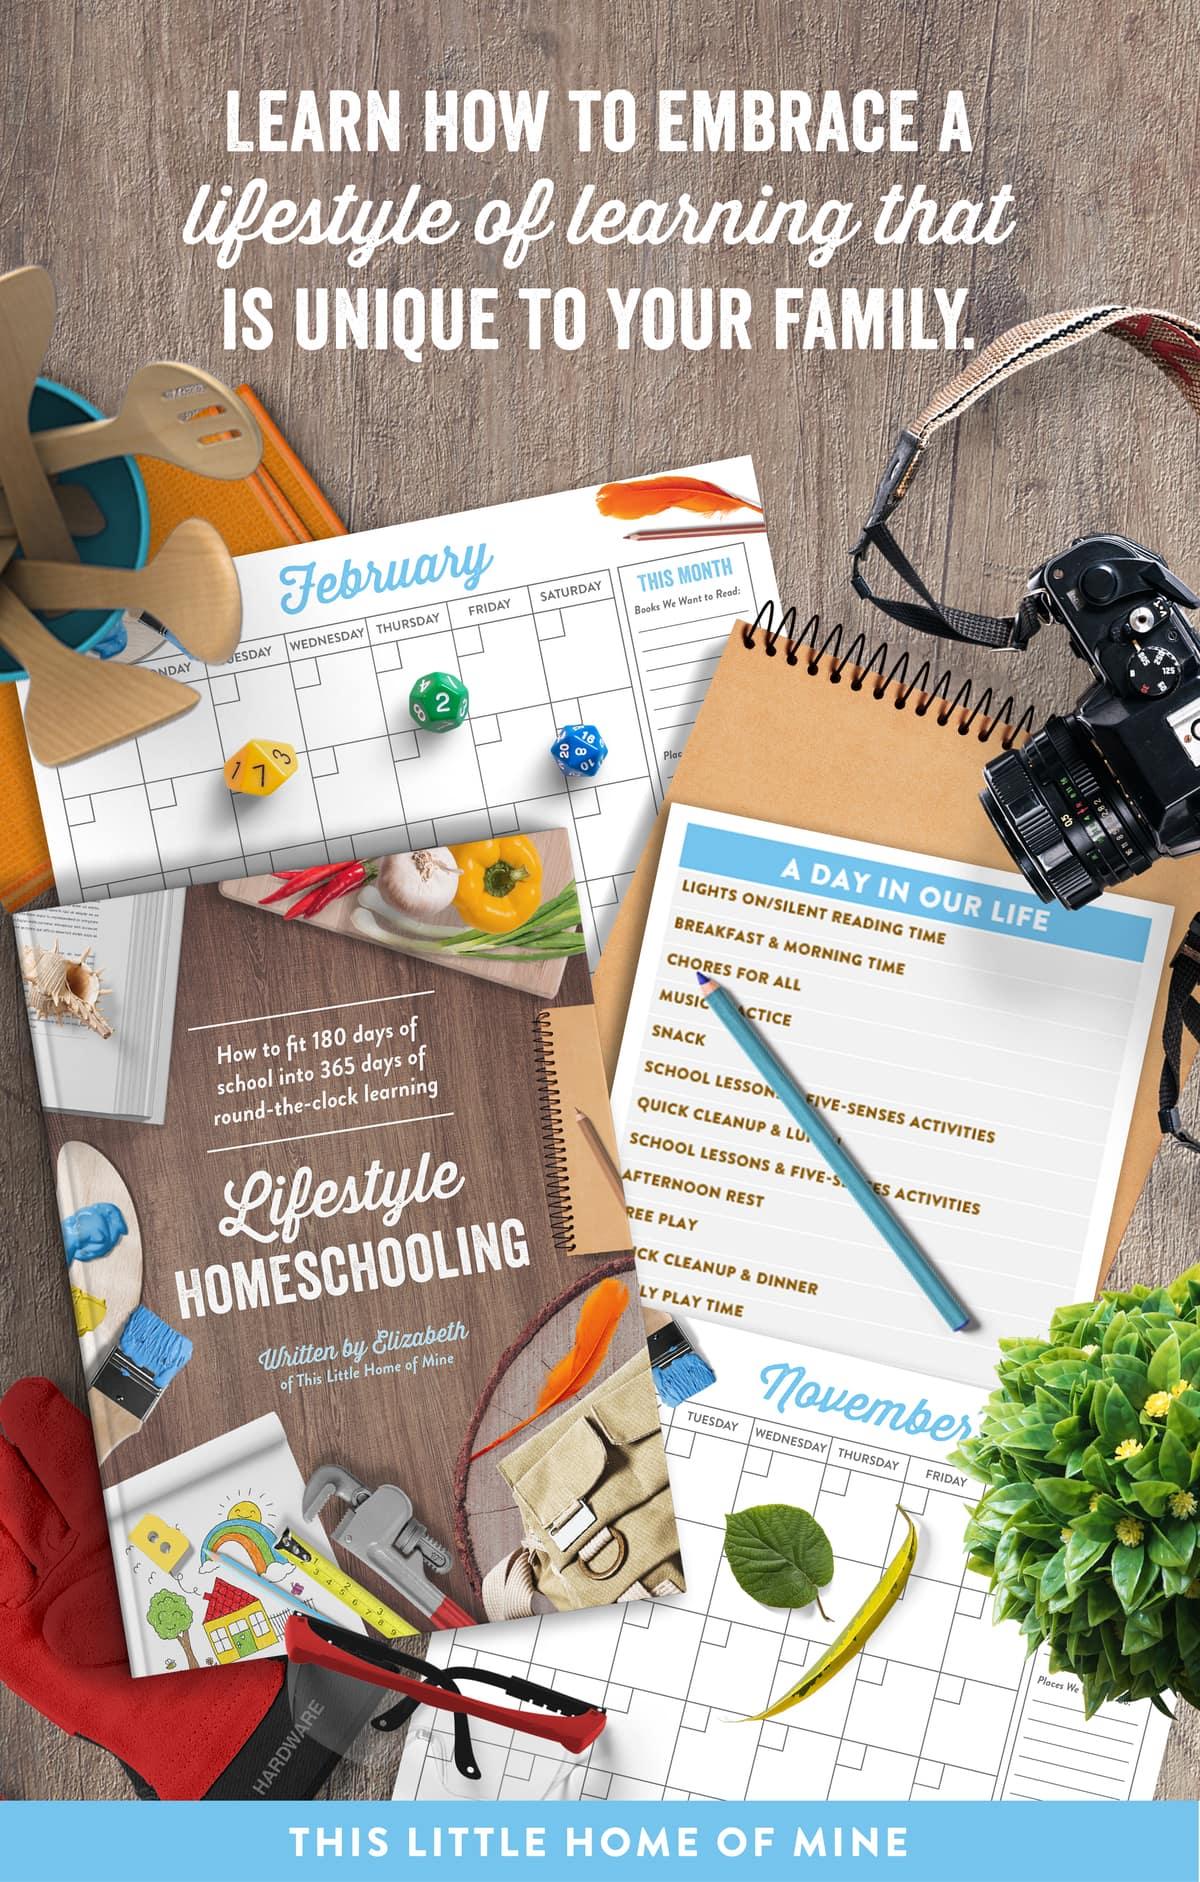 Lifestyle Homeschooling eBook